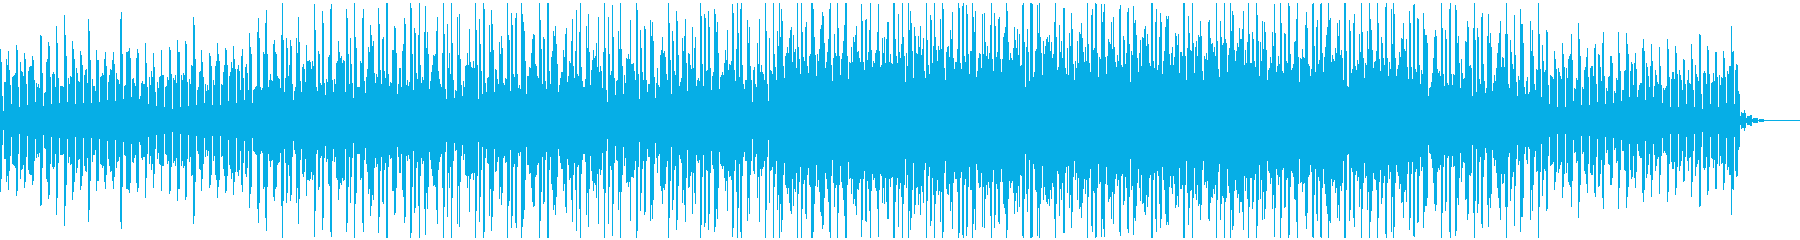 psytrance/シンセループの再生済みの波形